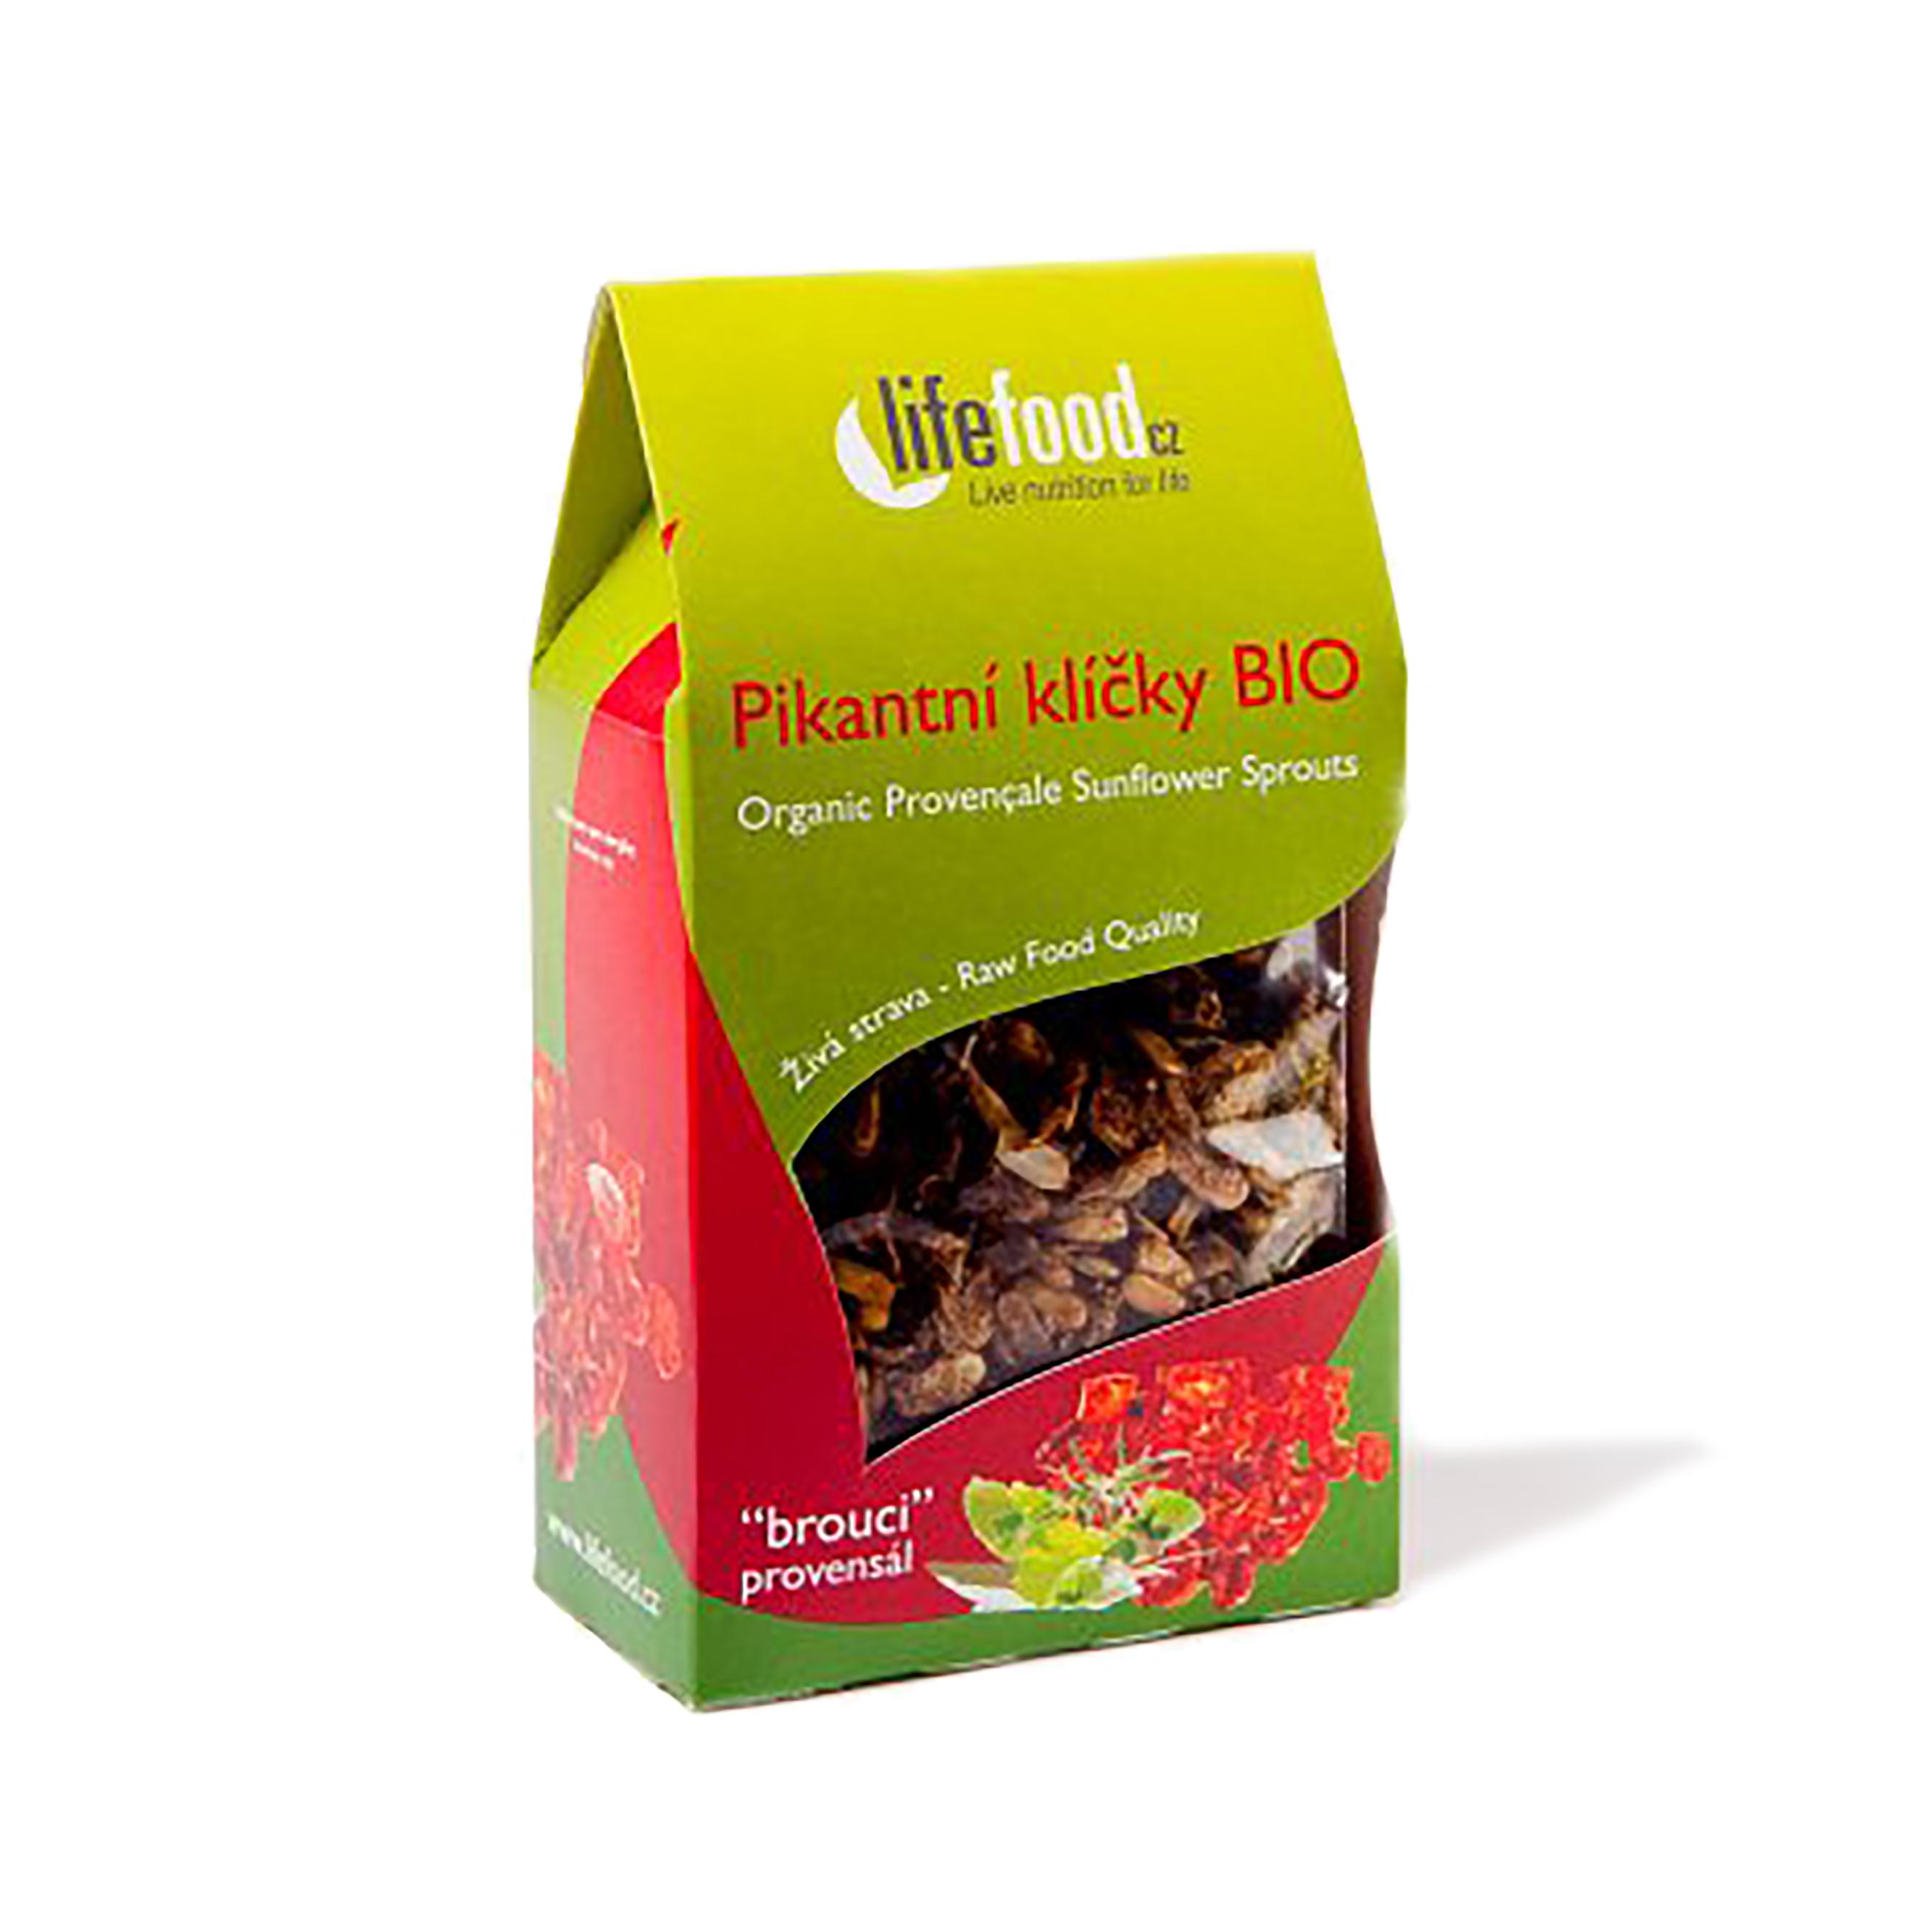 Brouci provensal bio 100g lifefood